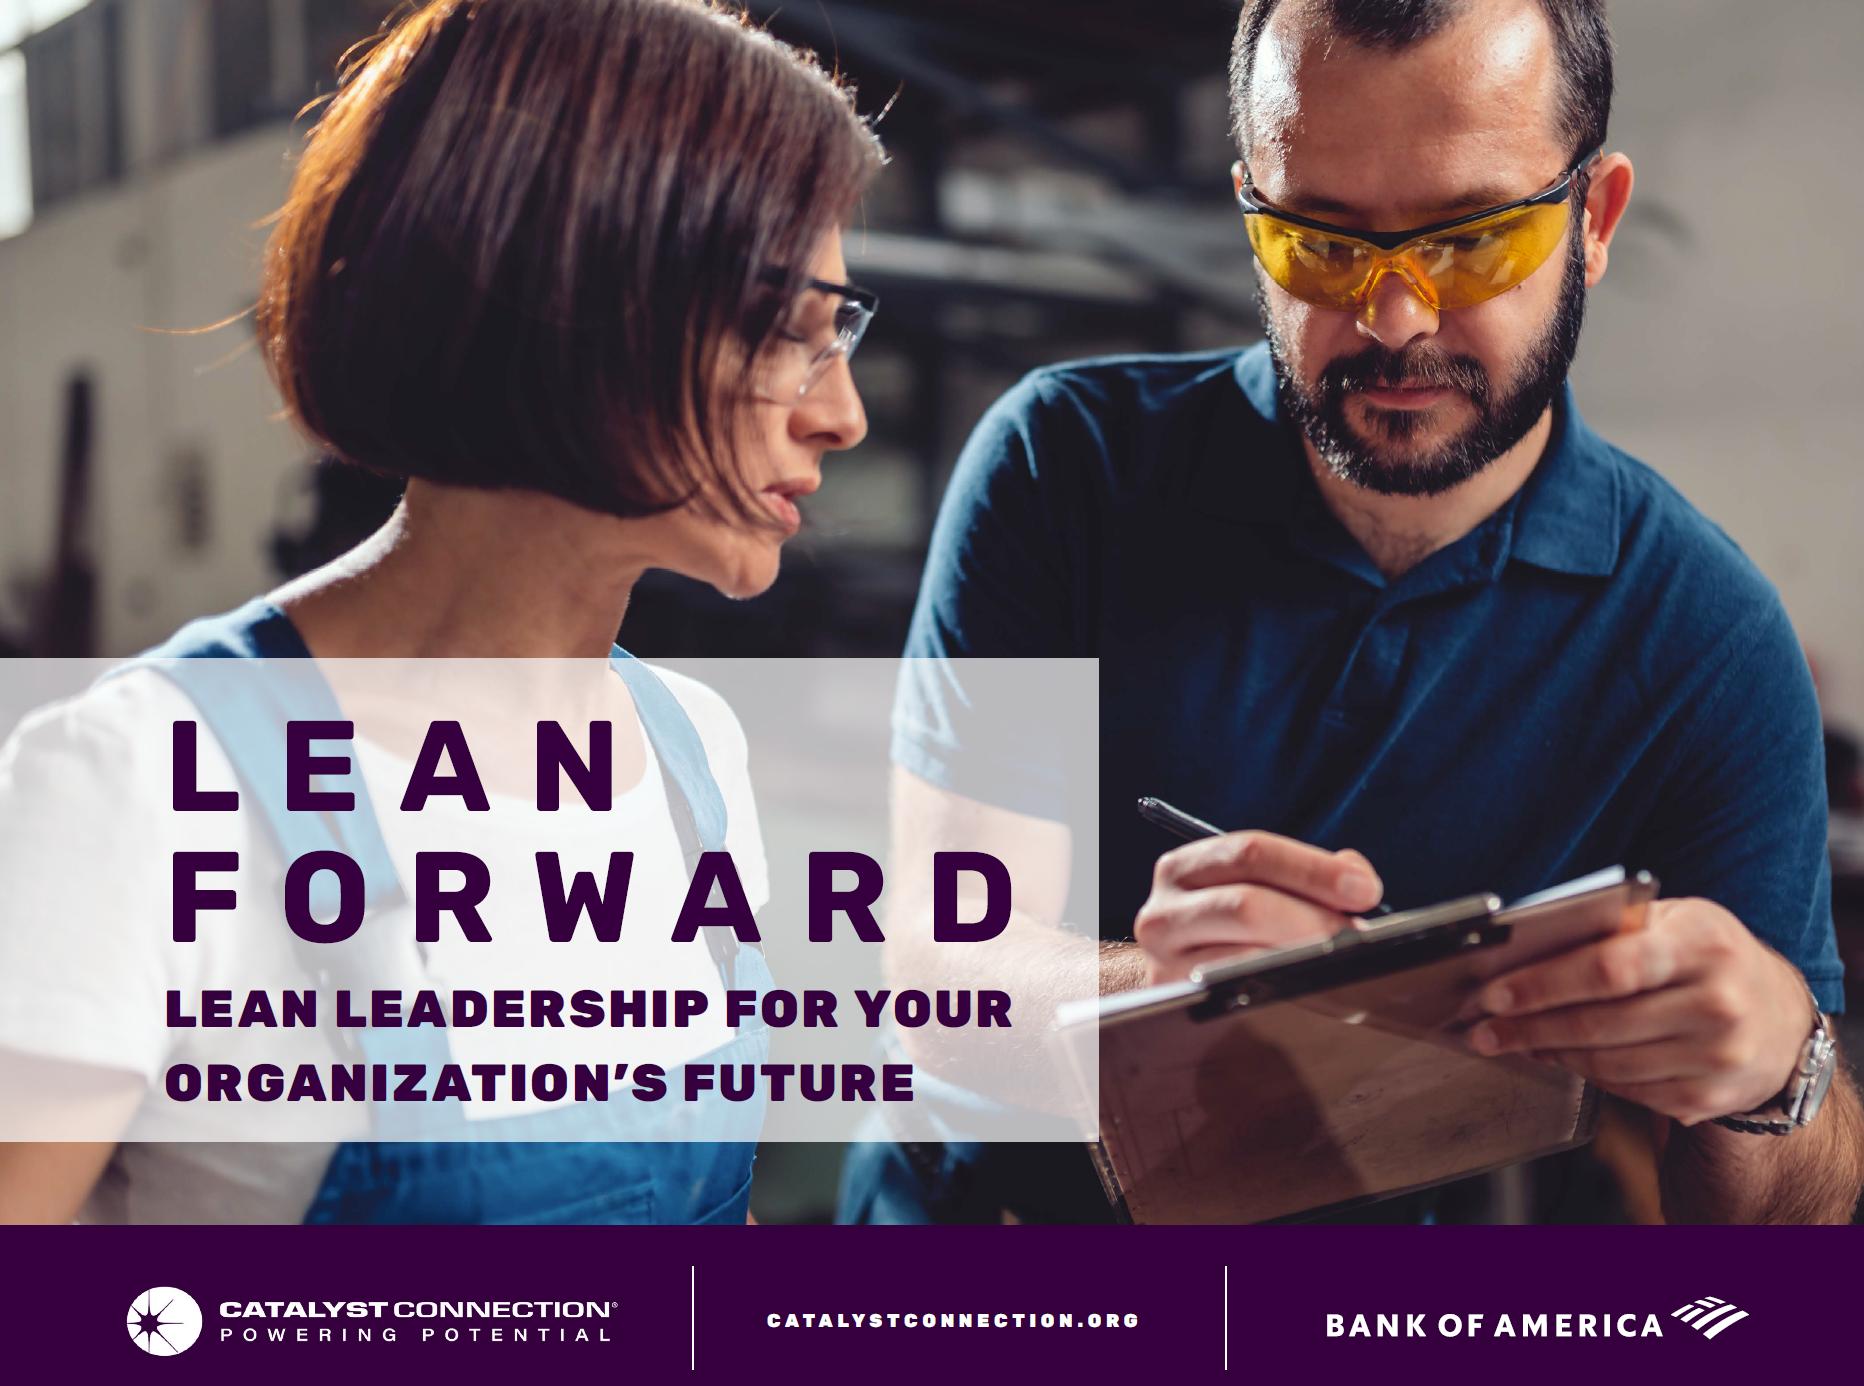 Lean Forward: Volume 2 - Lean Leadership for Your Organization's Future